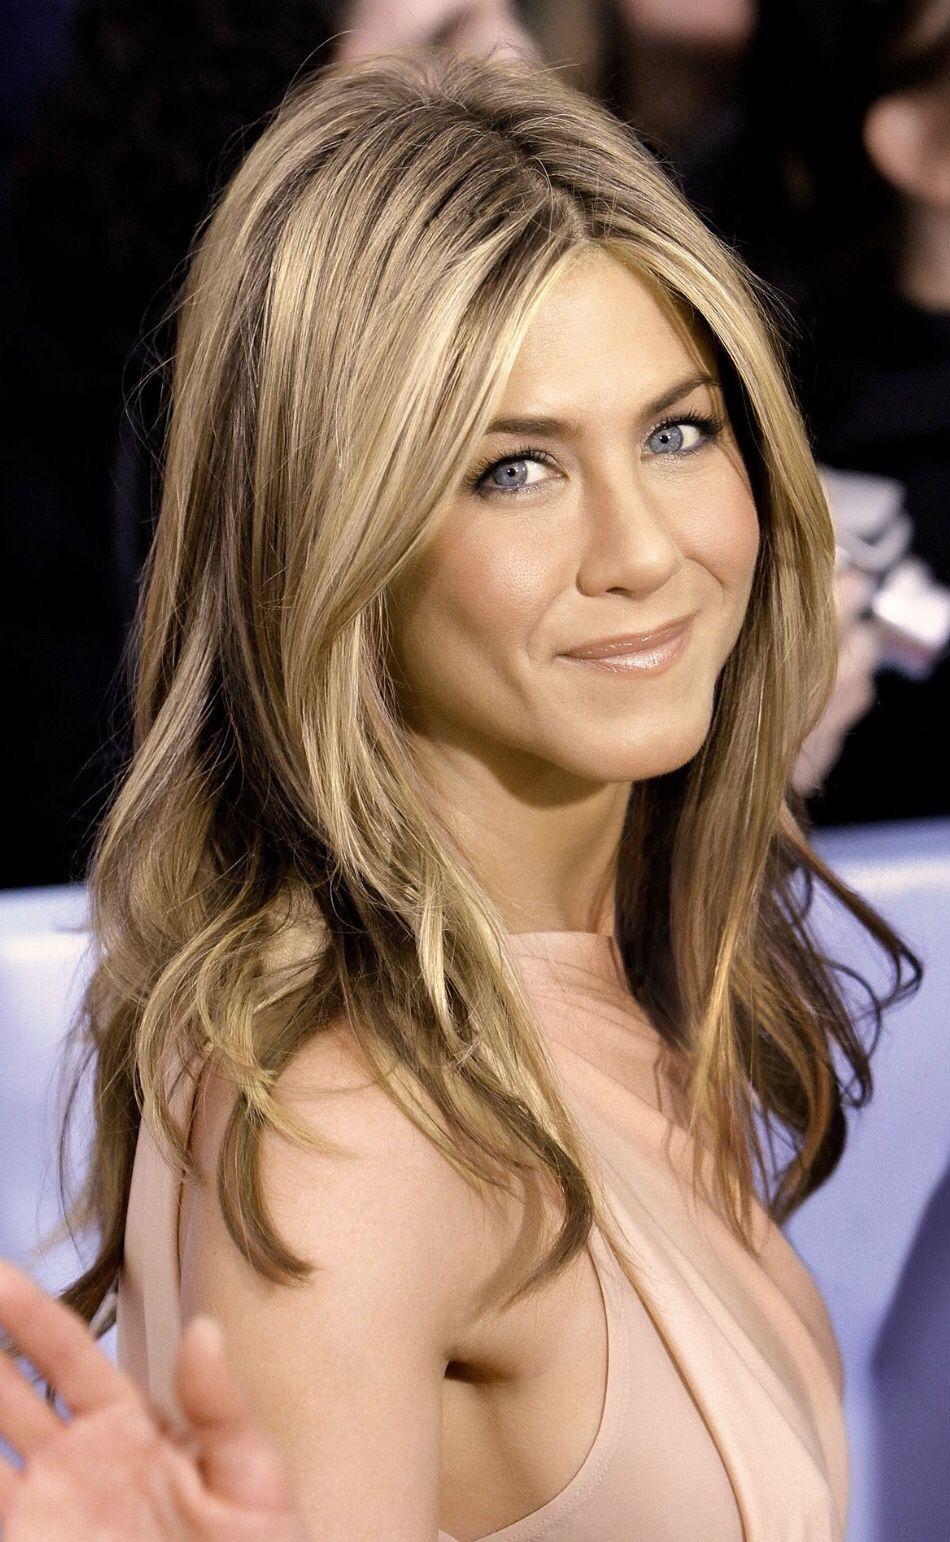 Actriz Porno Aniston 2613 best steel images in 2020 | celebrities, celebs